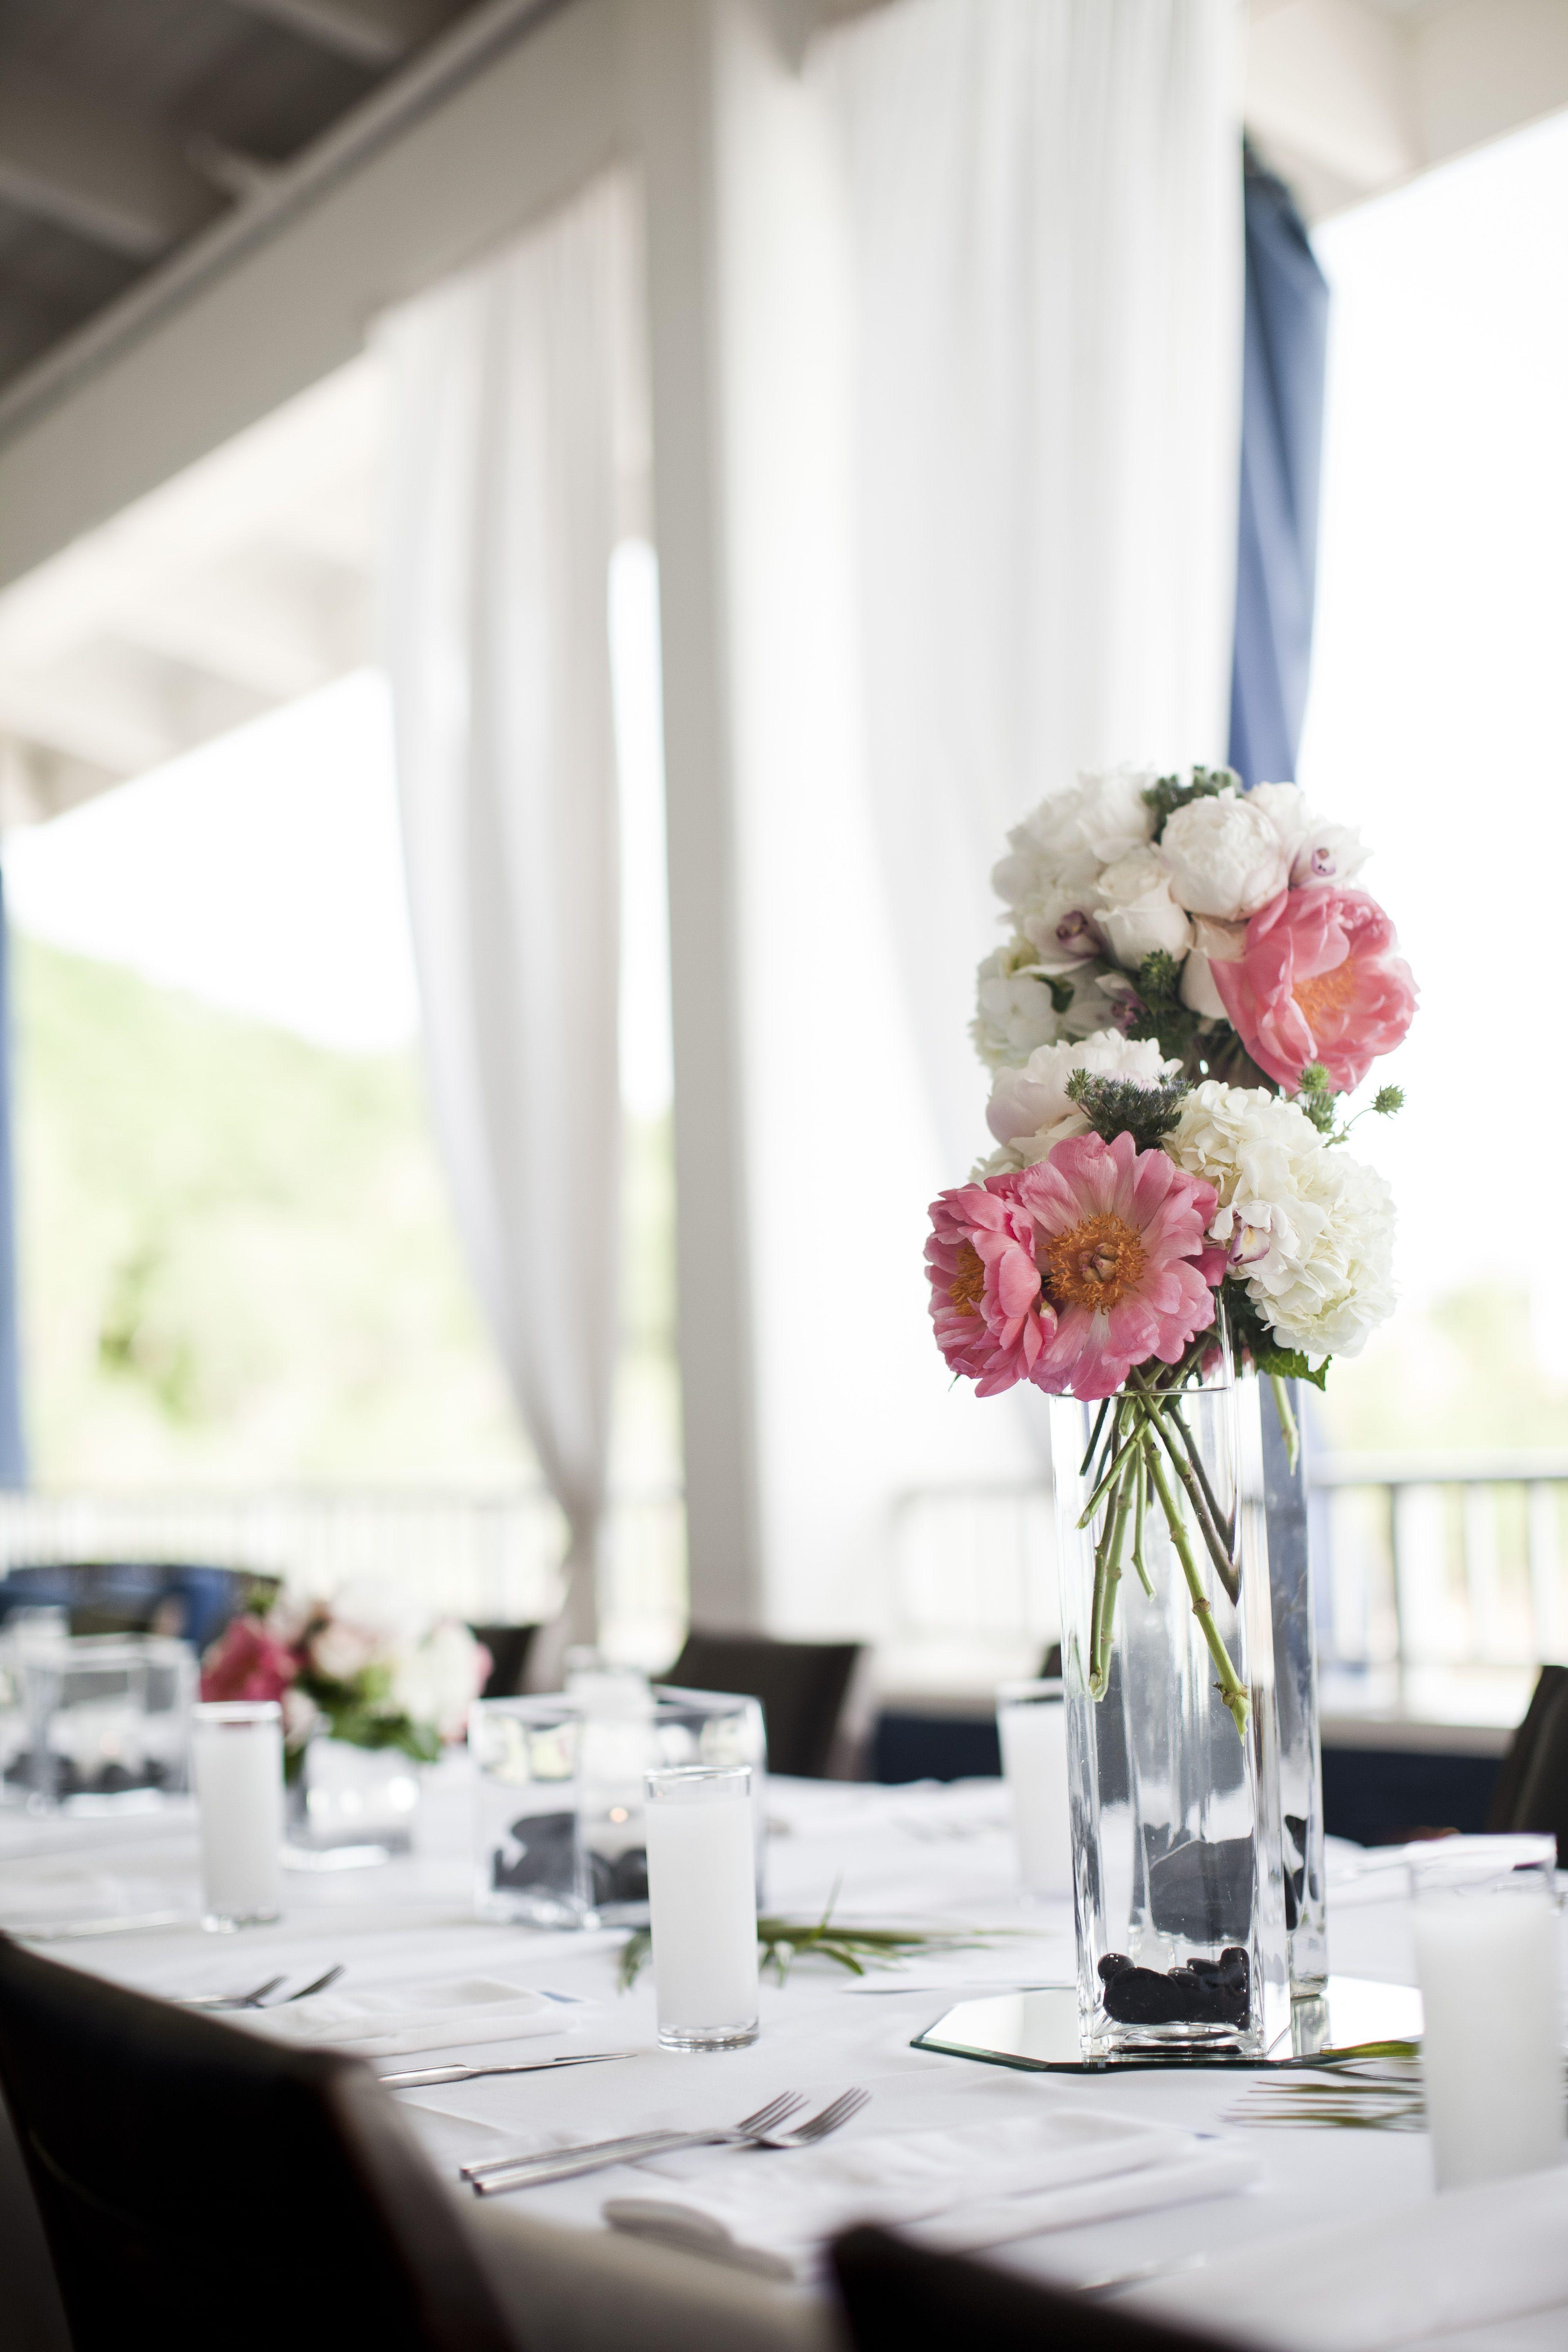 destination wedding centerpieces/decor | Wedding | Pinterest ...